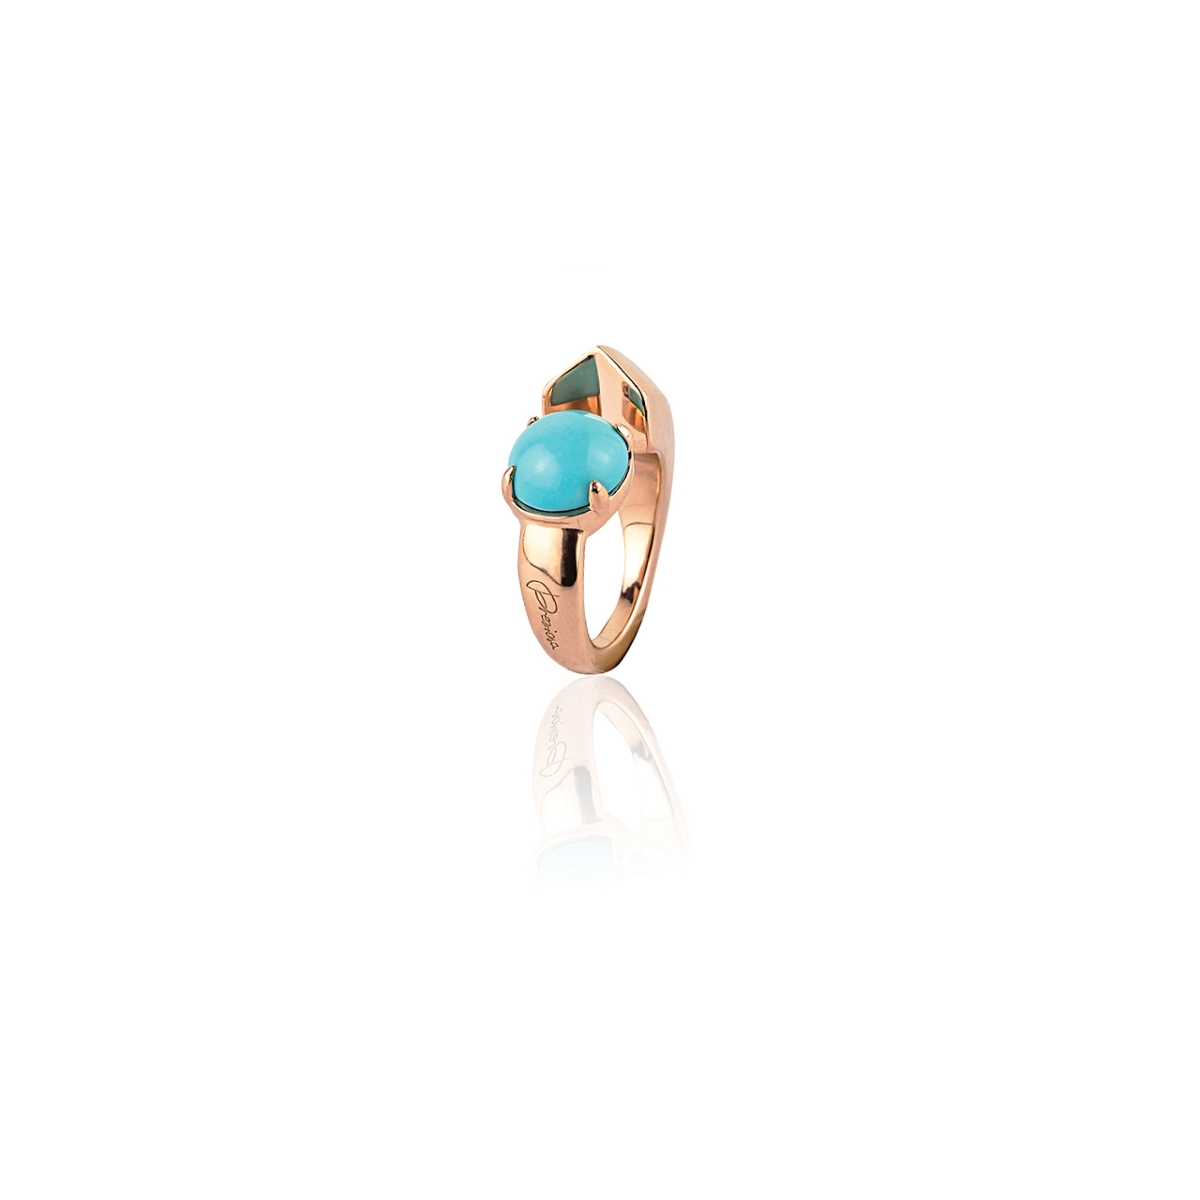 Turquoise bijoux précieux Alejandra